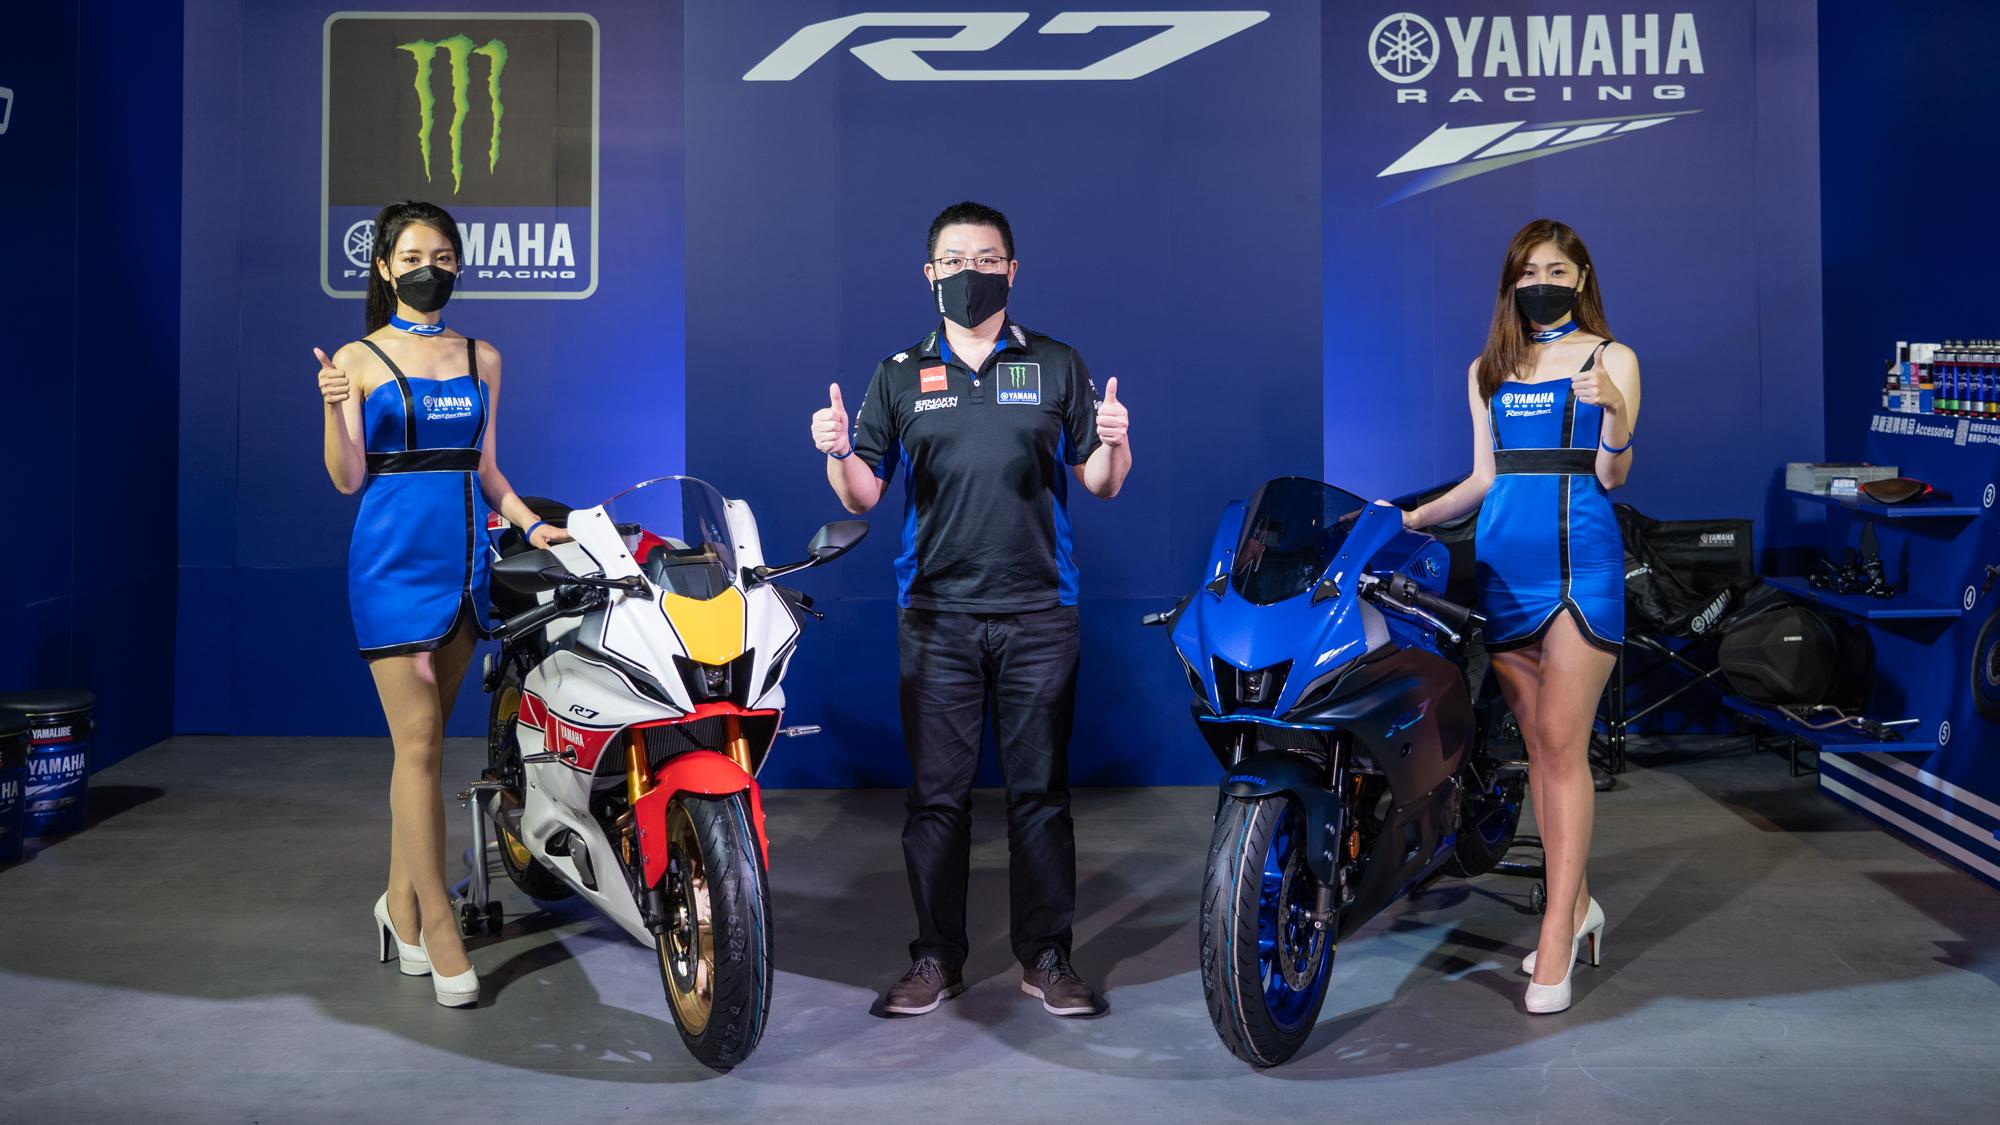 Yamaha YZF-R7 正式上市!加碼 60 週年紀念車型,9/18~19 舉辦「R/World」體驗